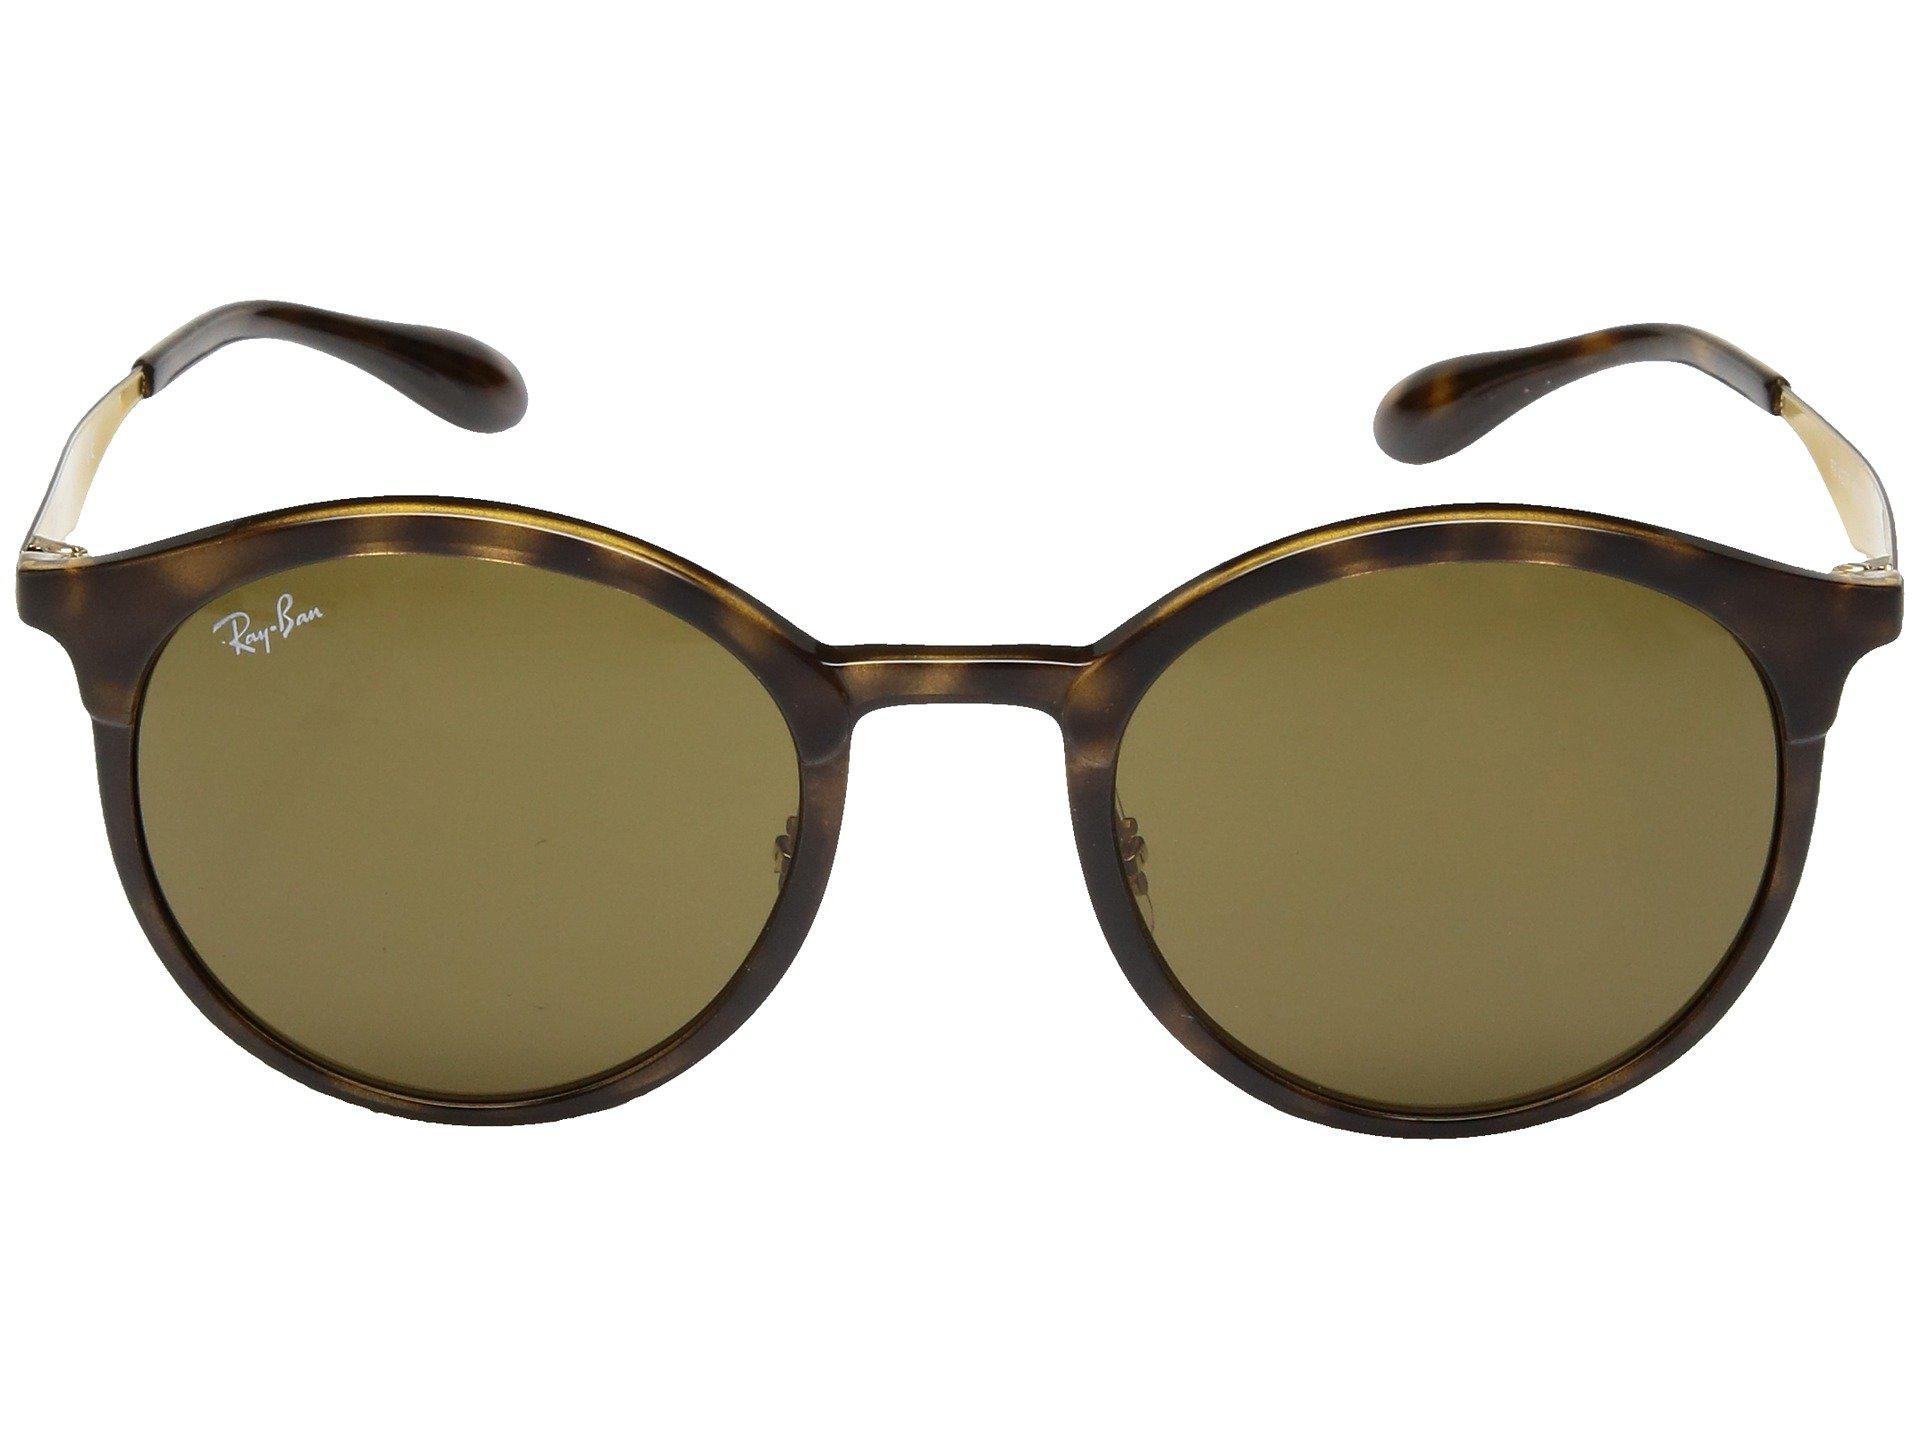 002784b44b Ray-Ban - Rb4277 Emma 51mm (havana dark Brown) Fashion Sunglasses -. View  fullscreen